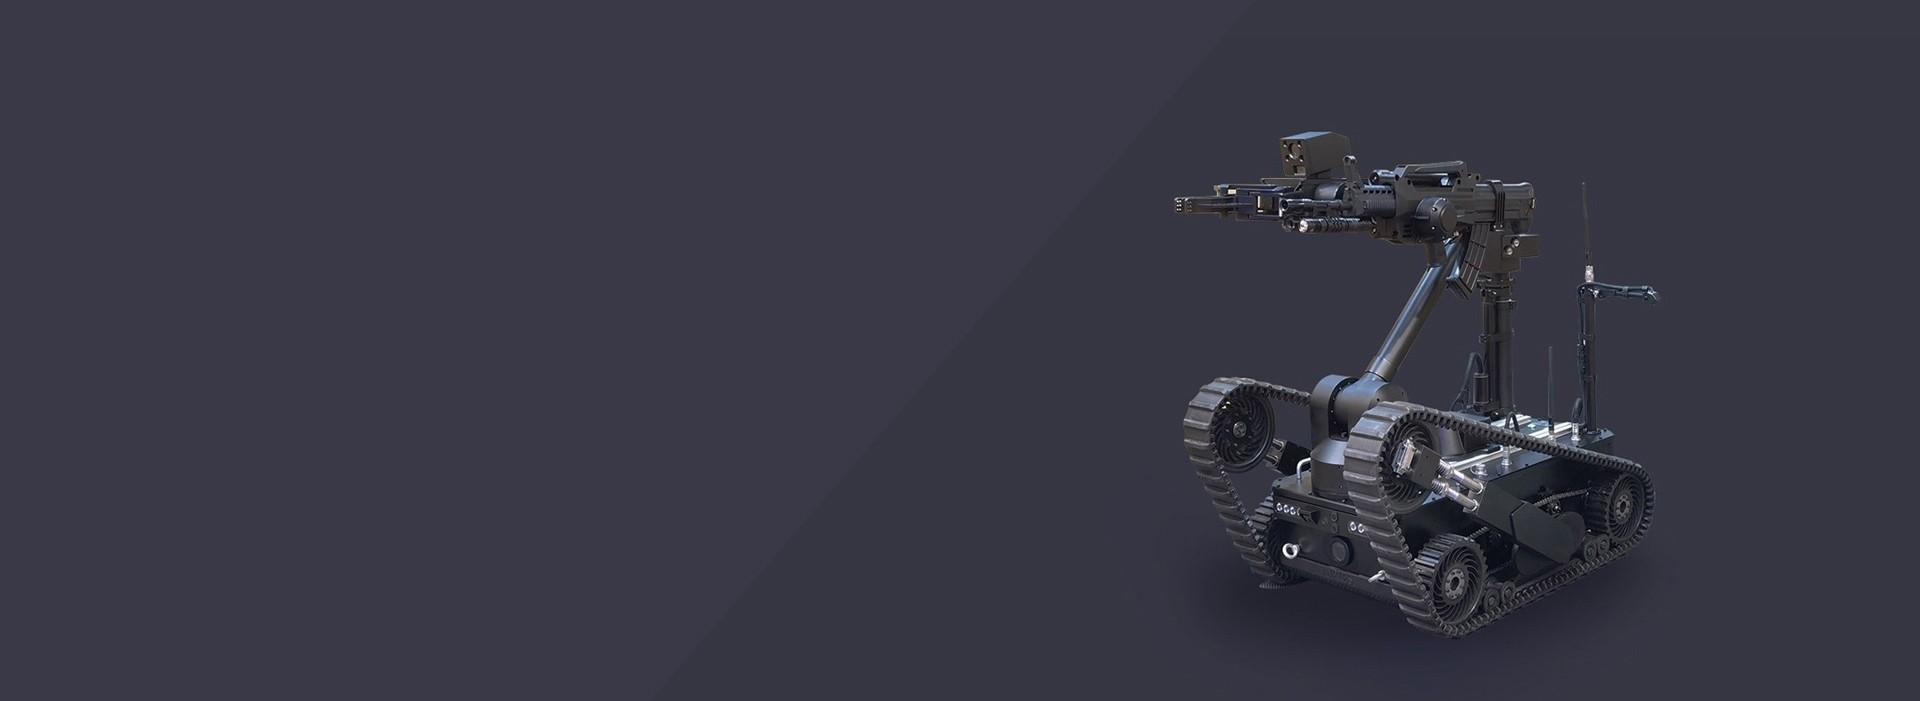 Long-range armed strike robot TrackerIIILS